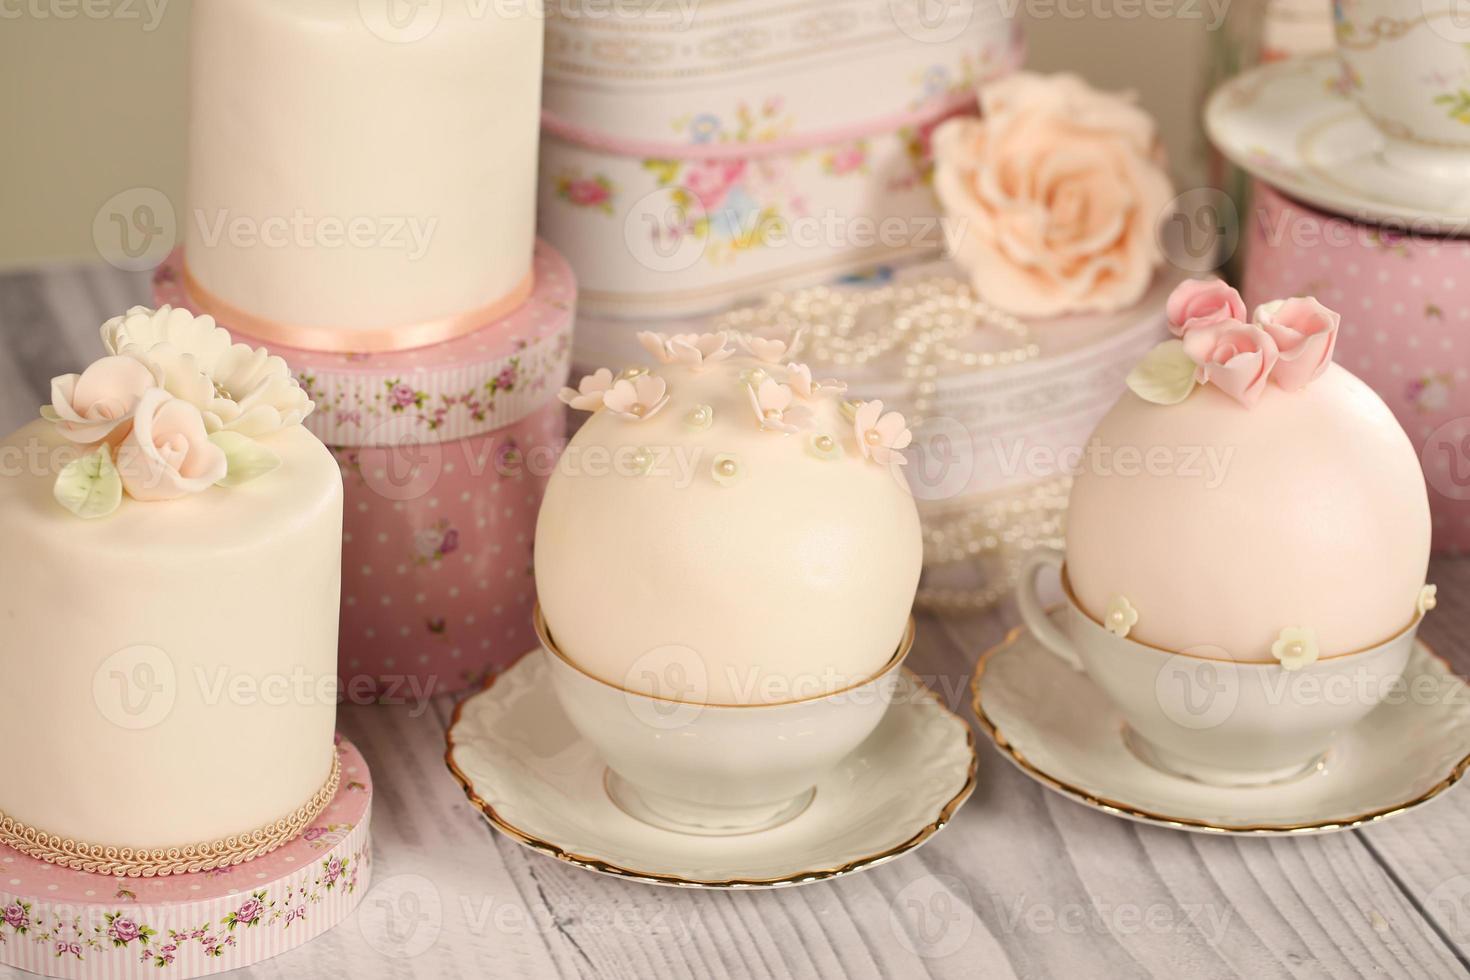 mini tortas con glaseado foto